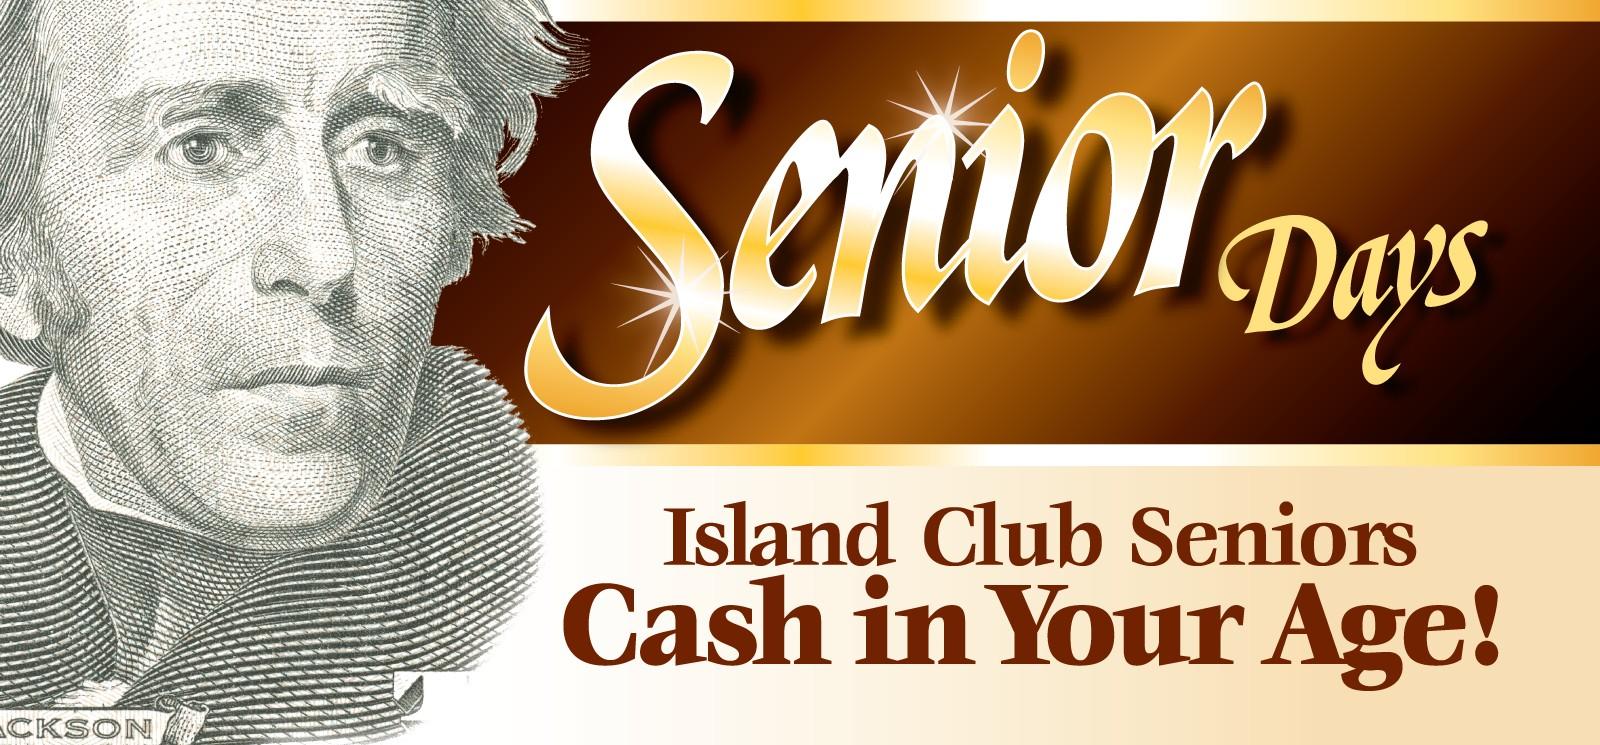 Seniors Cash April '14